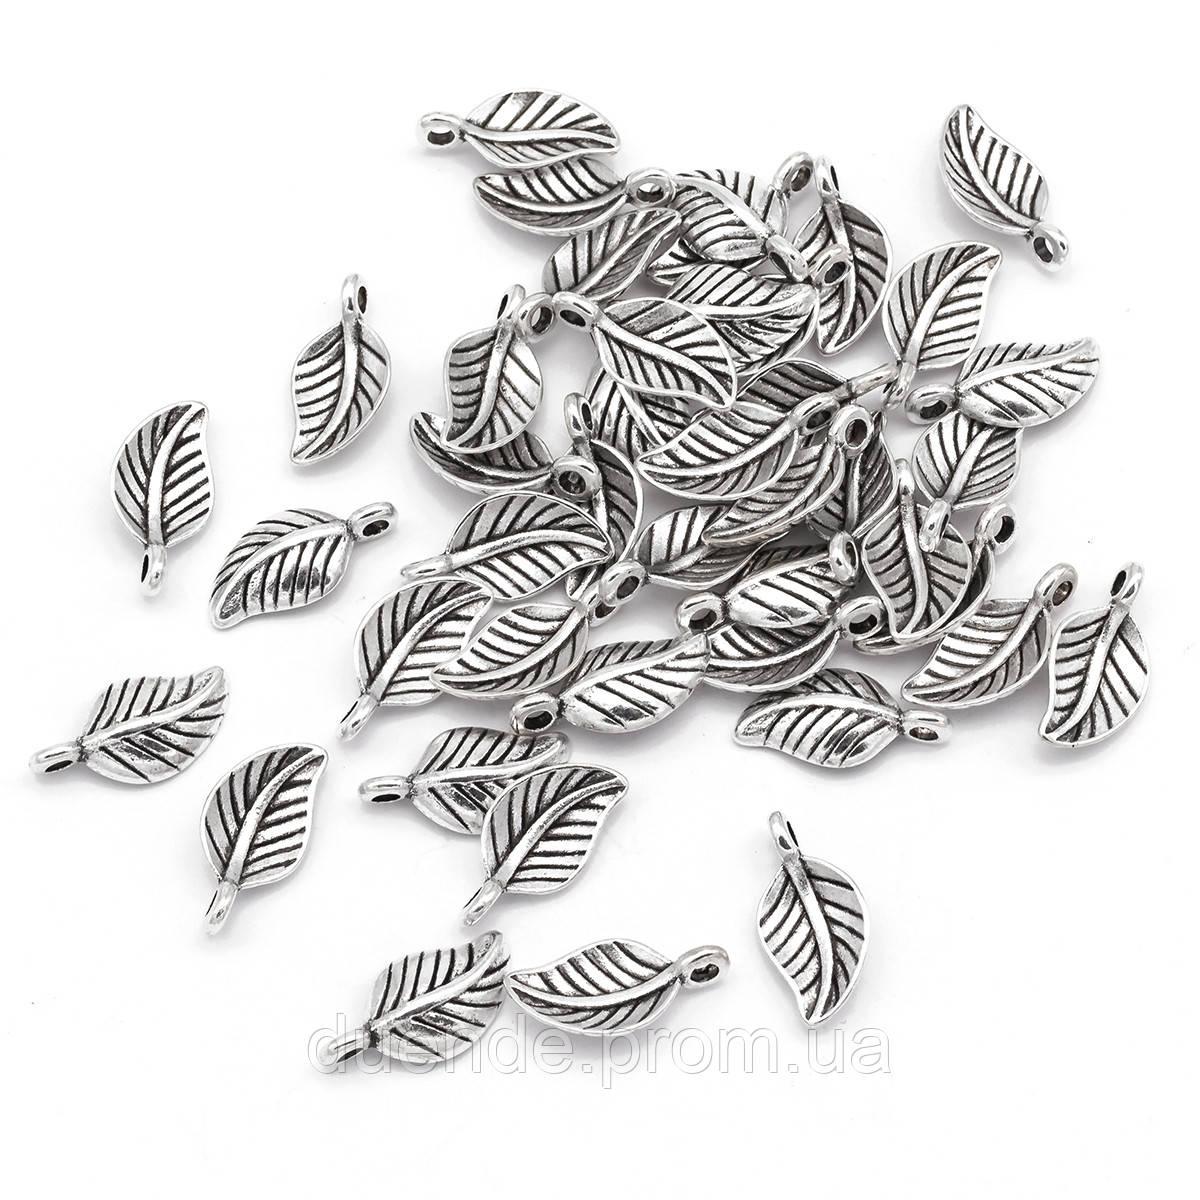 Подвески для браслетов Листики античное серебро, размер 14.5x7.5x4мм, 1 уп - 5 шт \ Sf - 020867